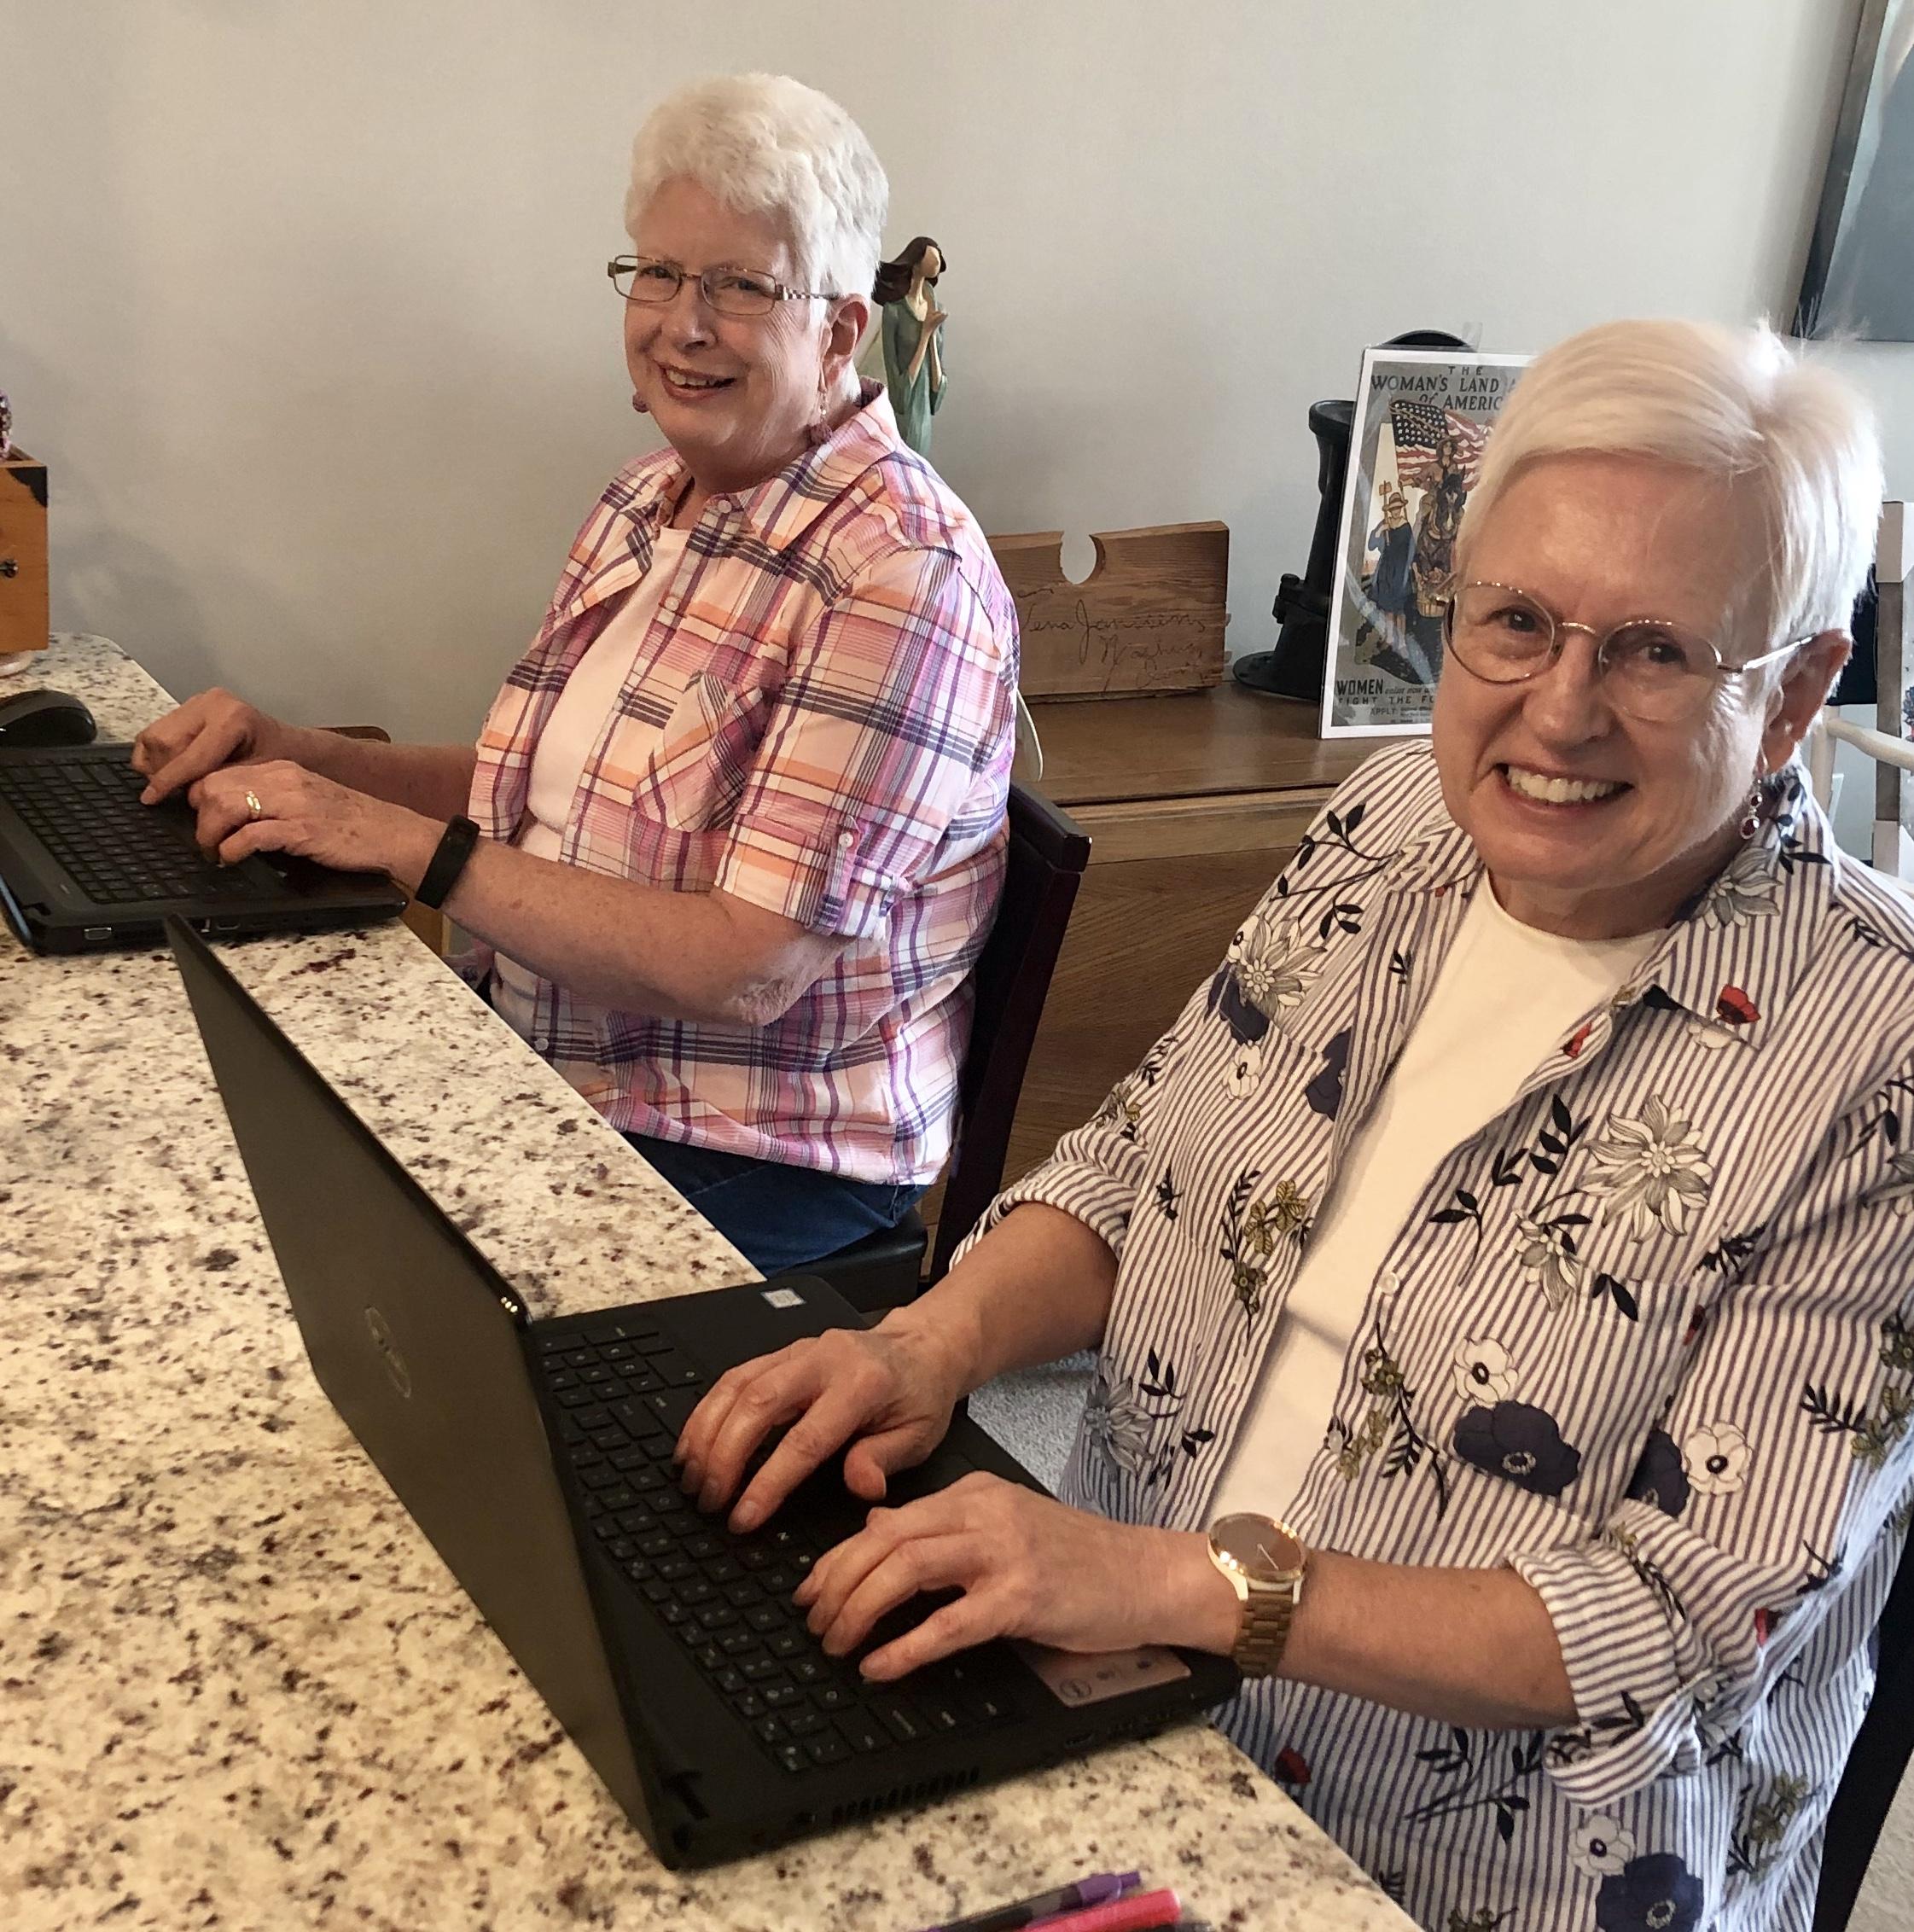 Tallgrass Creek residents embrace technology